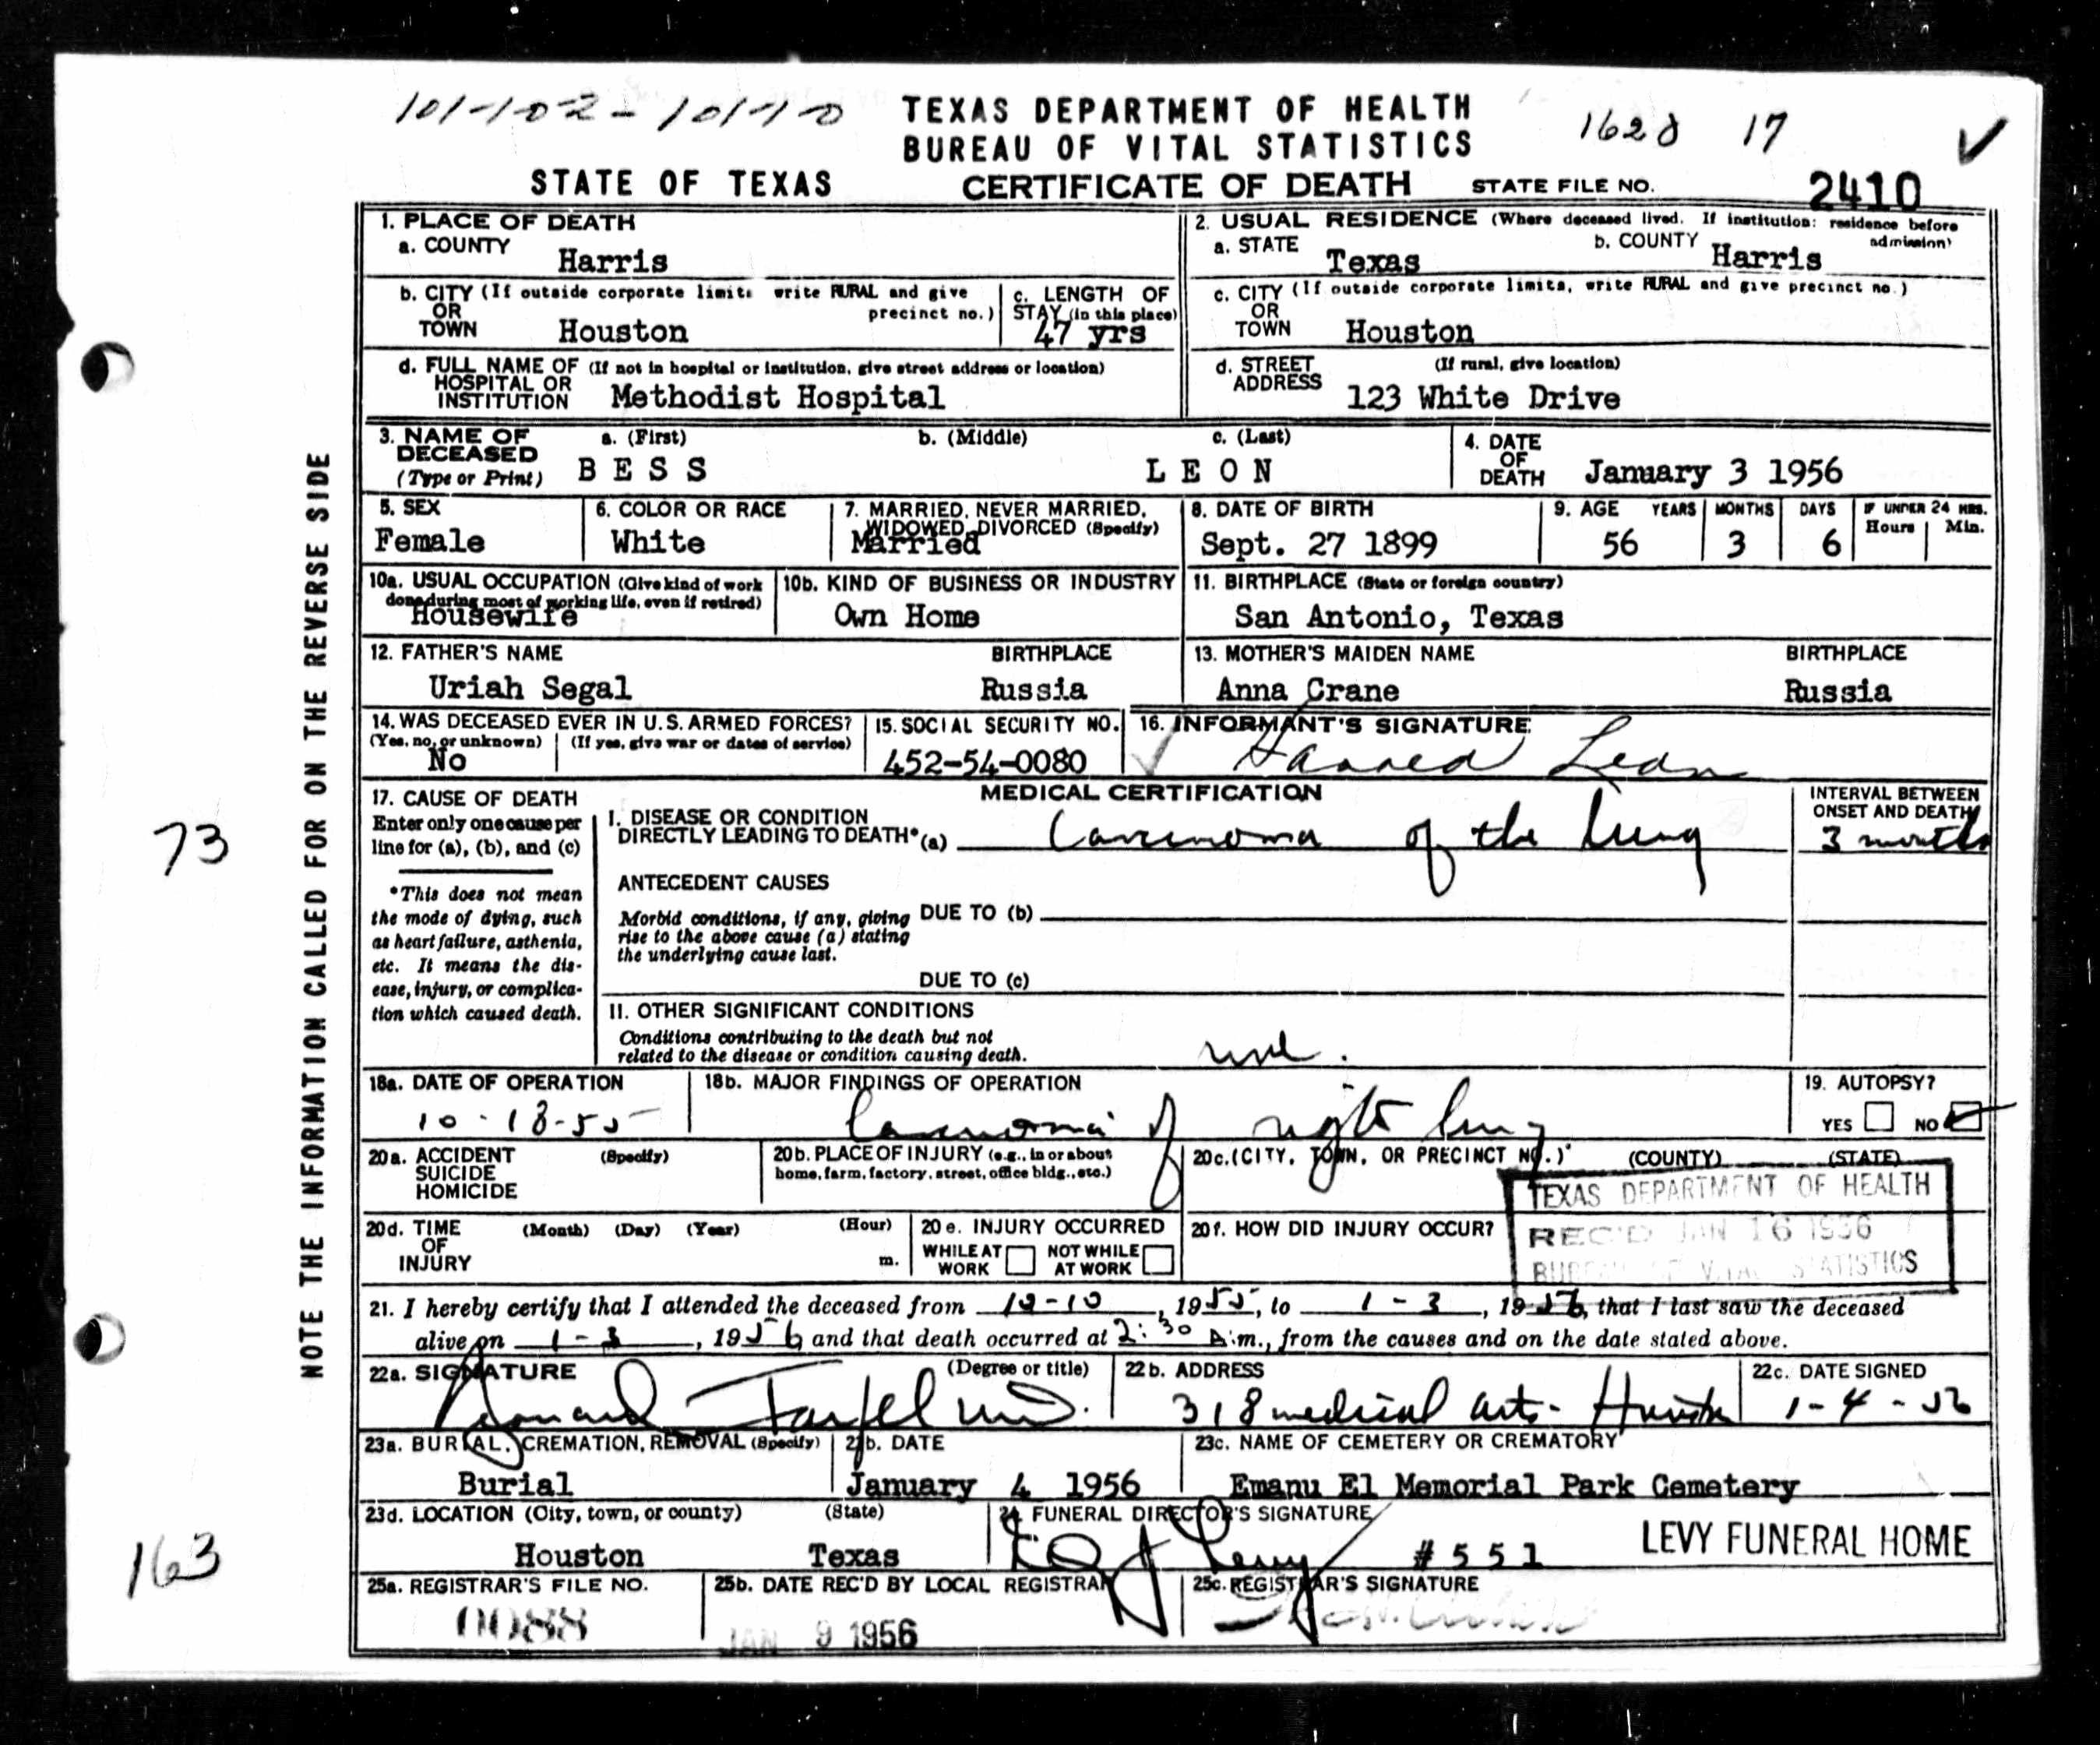 Bess Leon Birth Date 27 Sep 1899 Birth Place San Antonio Texas